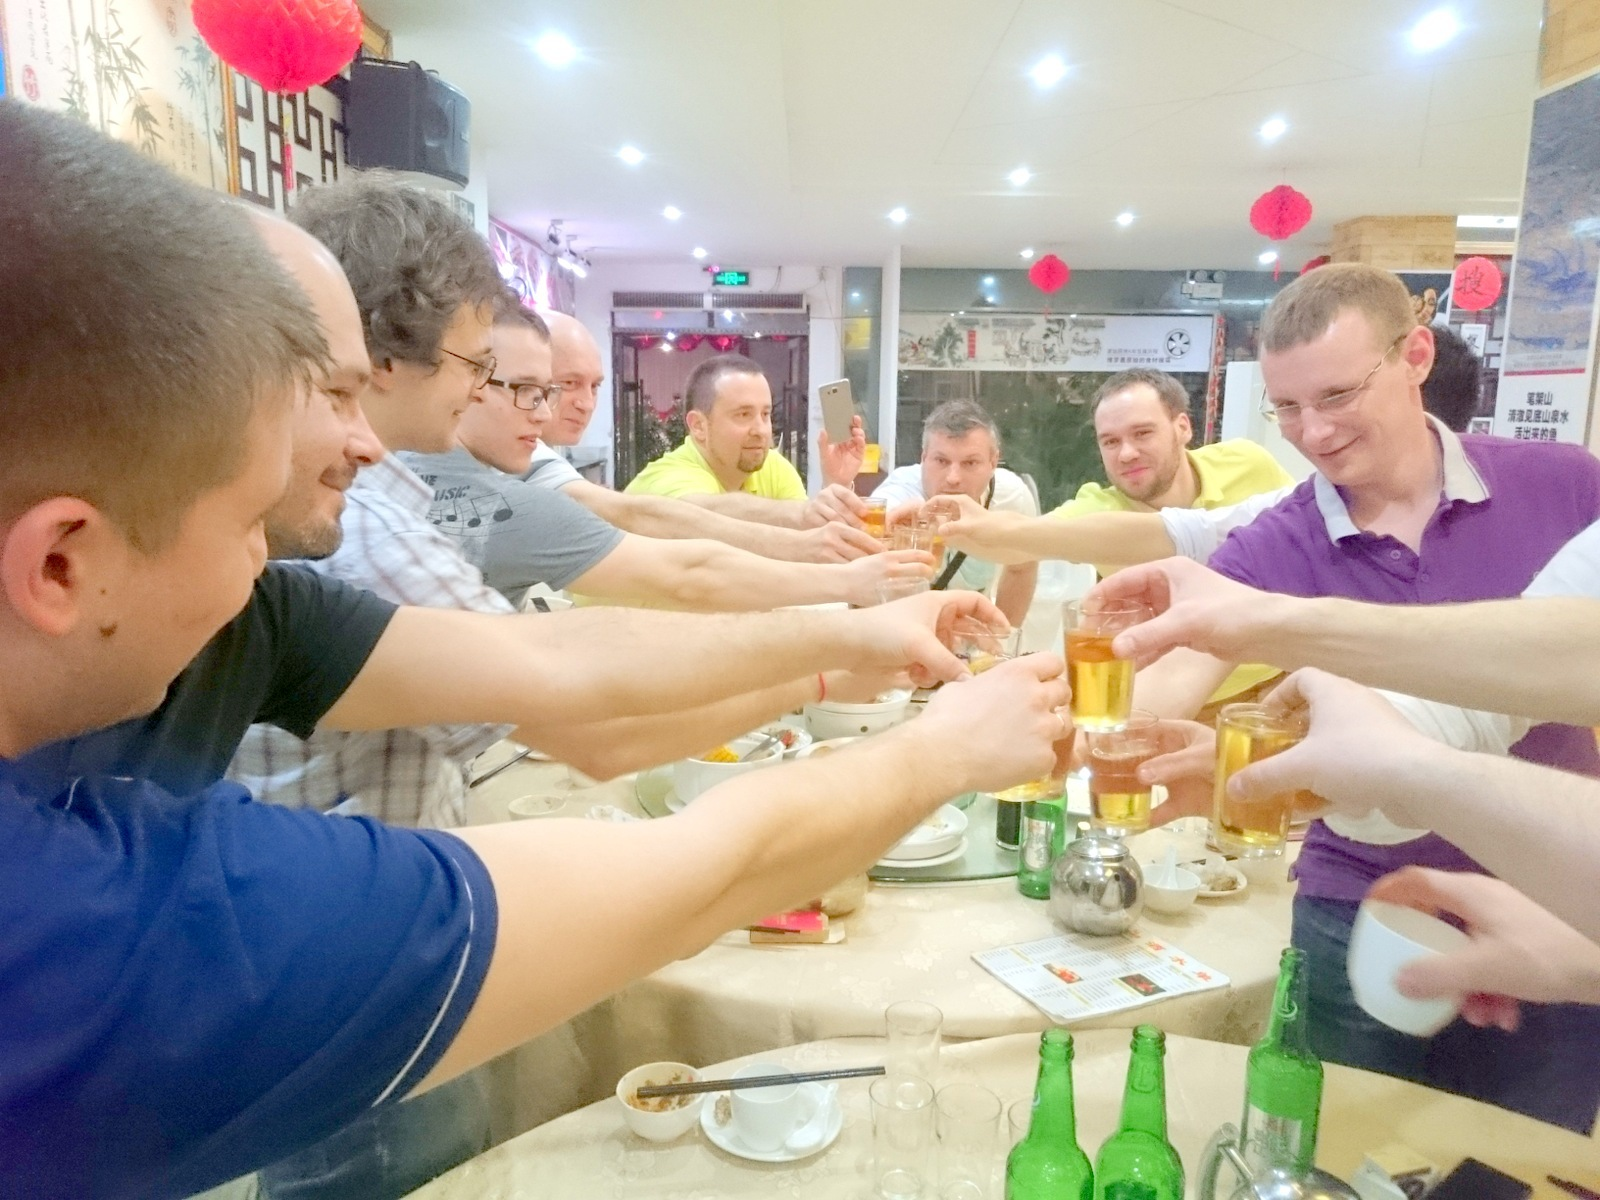 Китай. Завод устройств для «Умного дома». Учимся и учим - 10